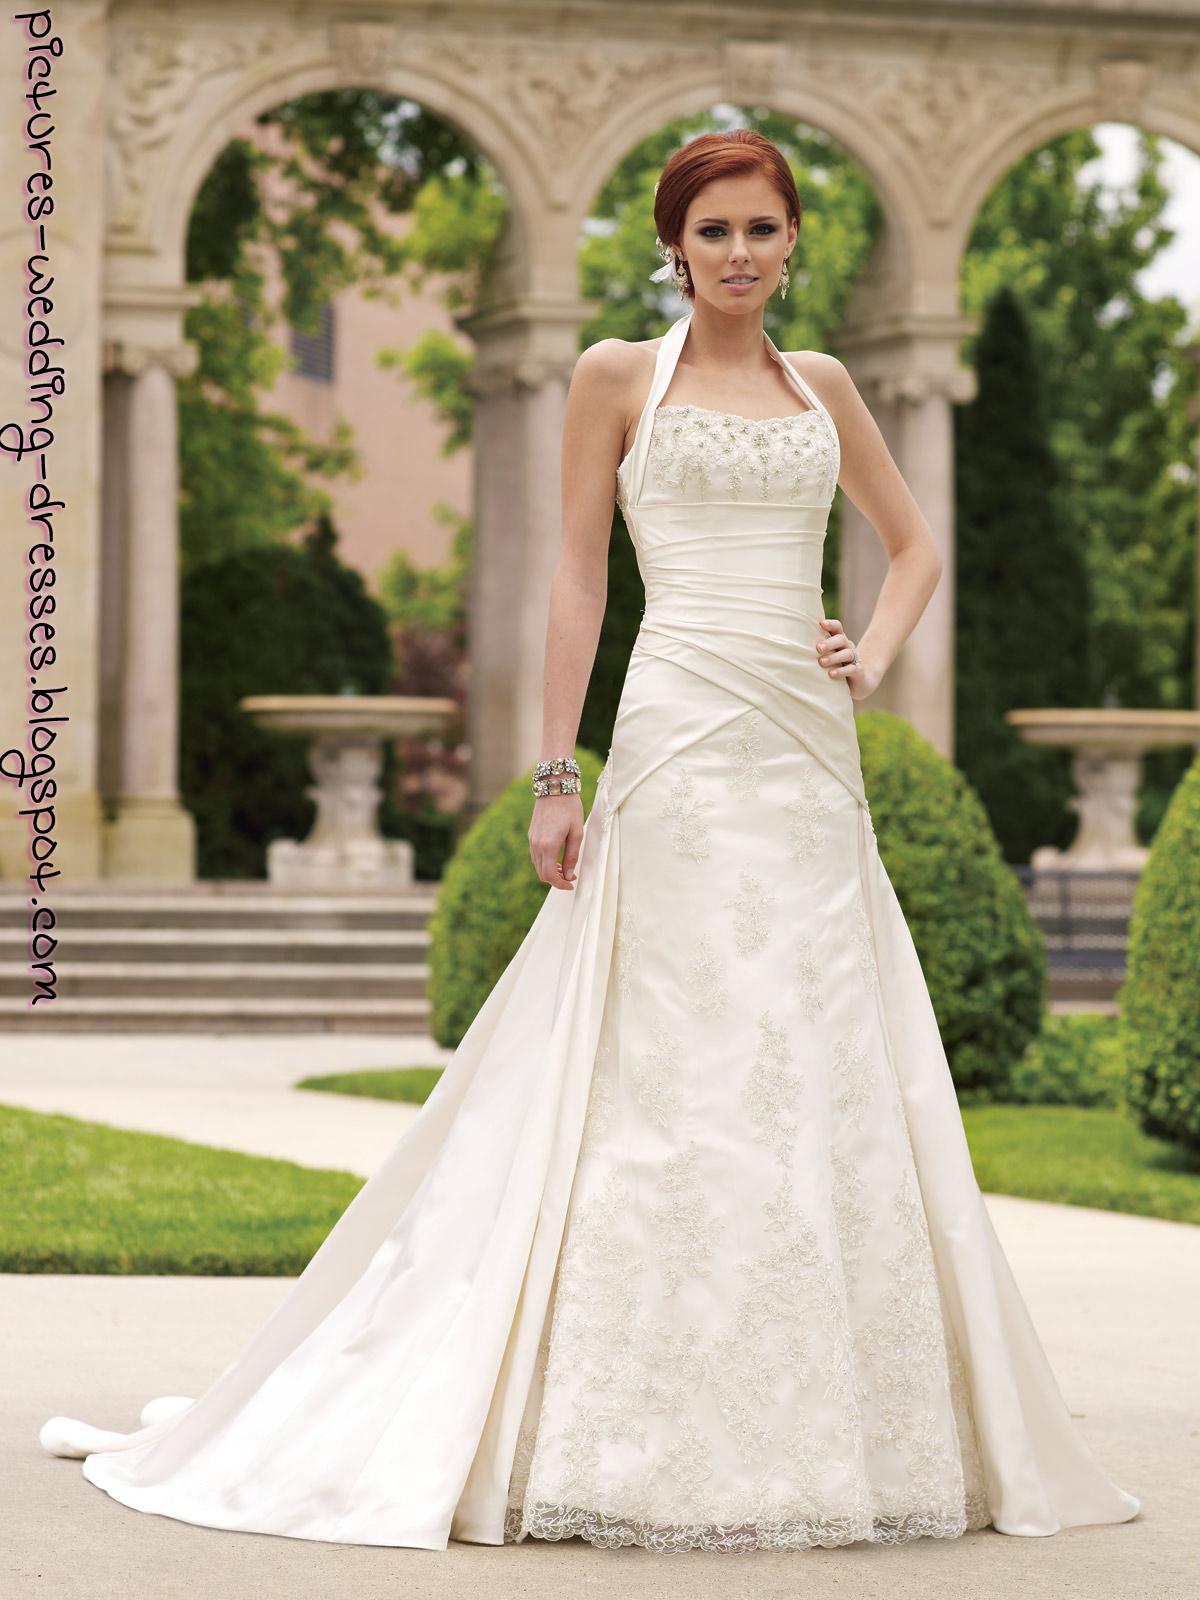 prom cinderella wedding dresses ball cinderella wedding dresses Prom Cinderella Wedding Dresses Ball Gowns Bridal